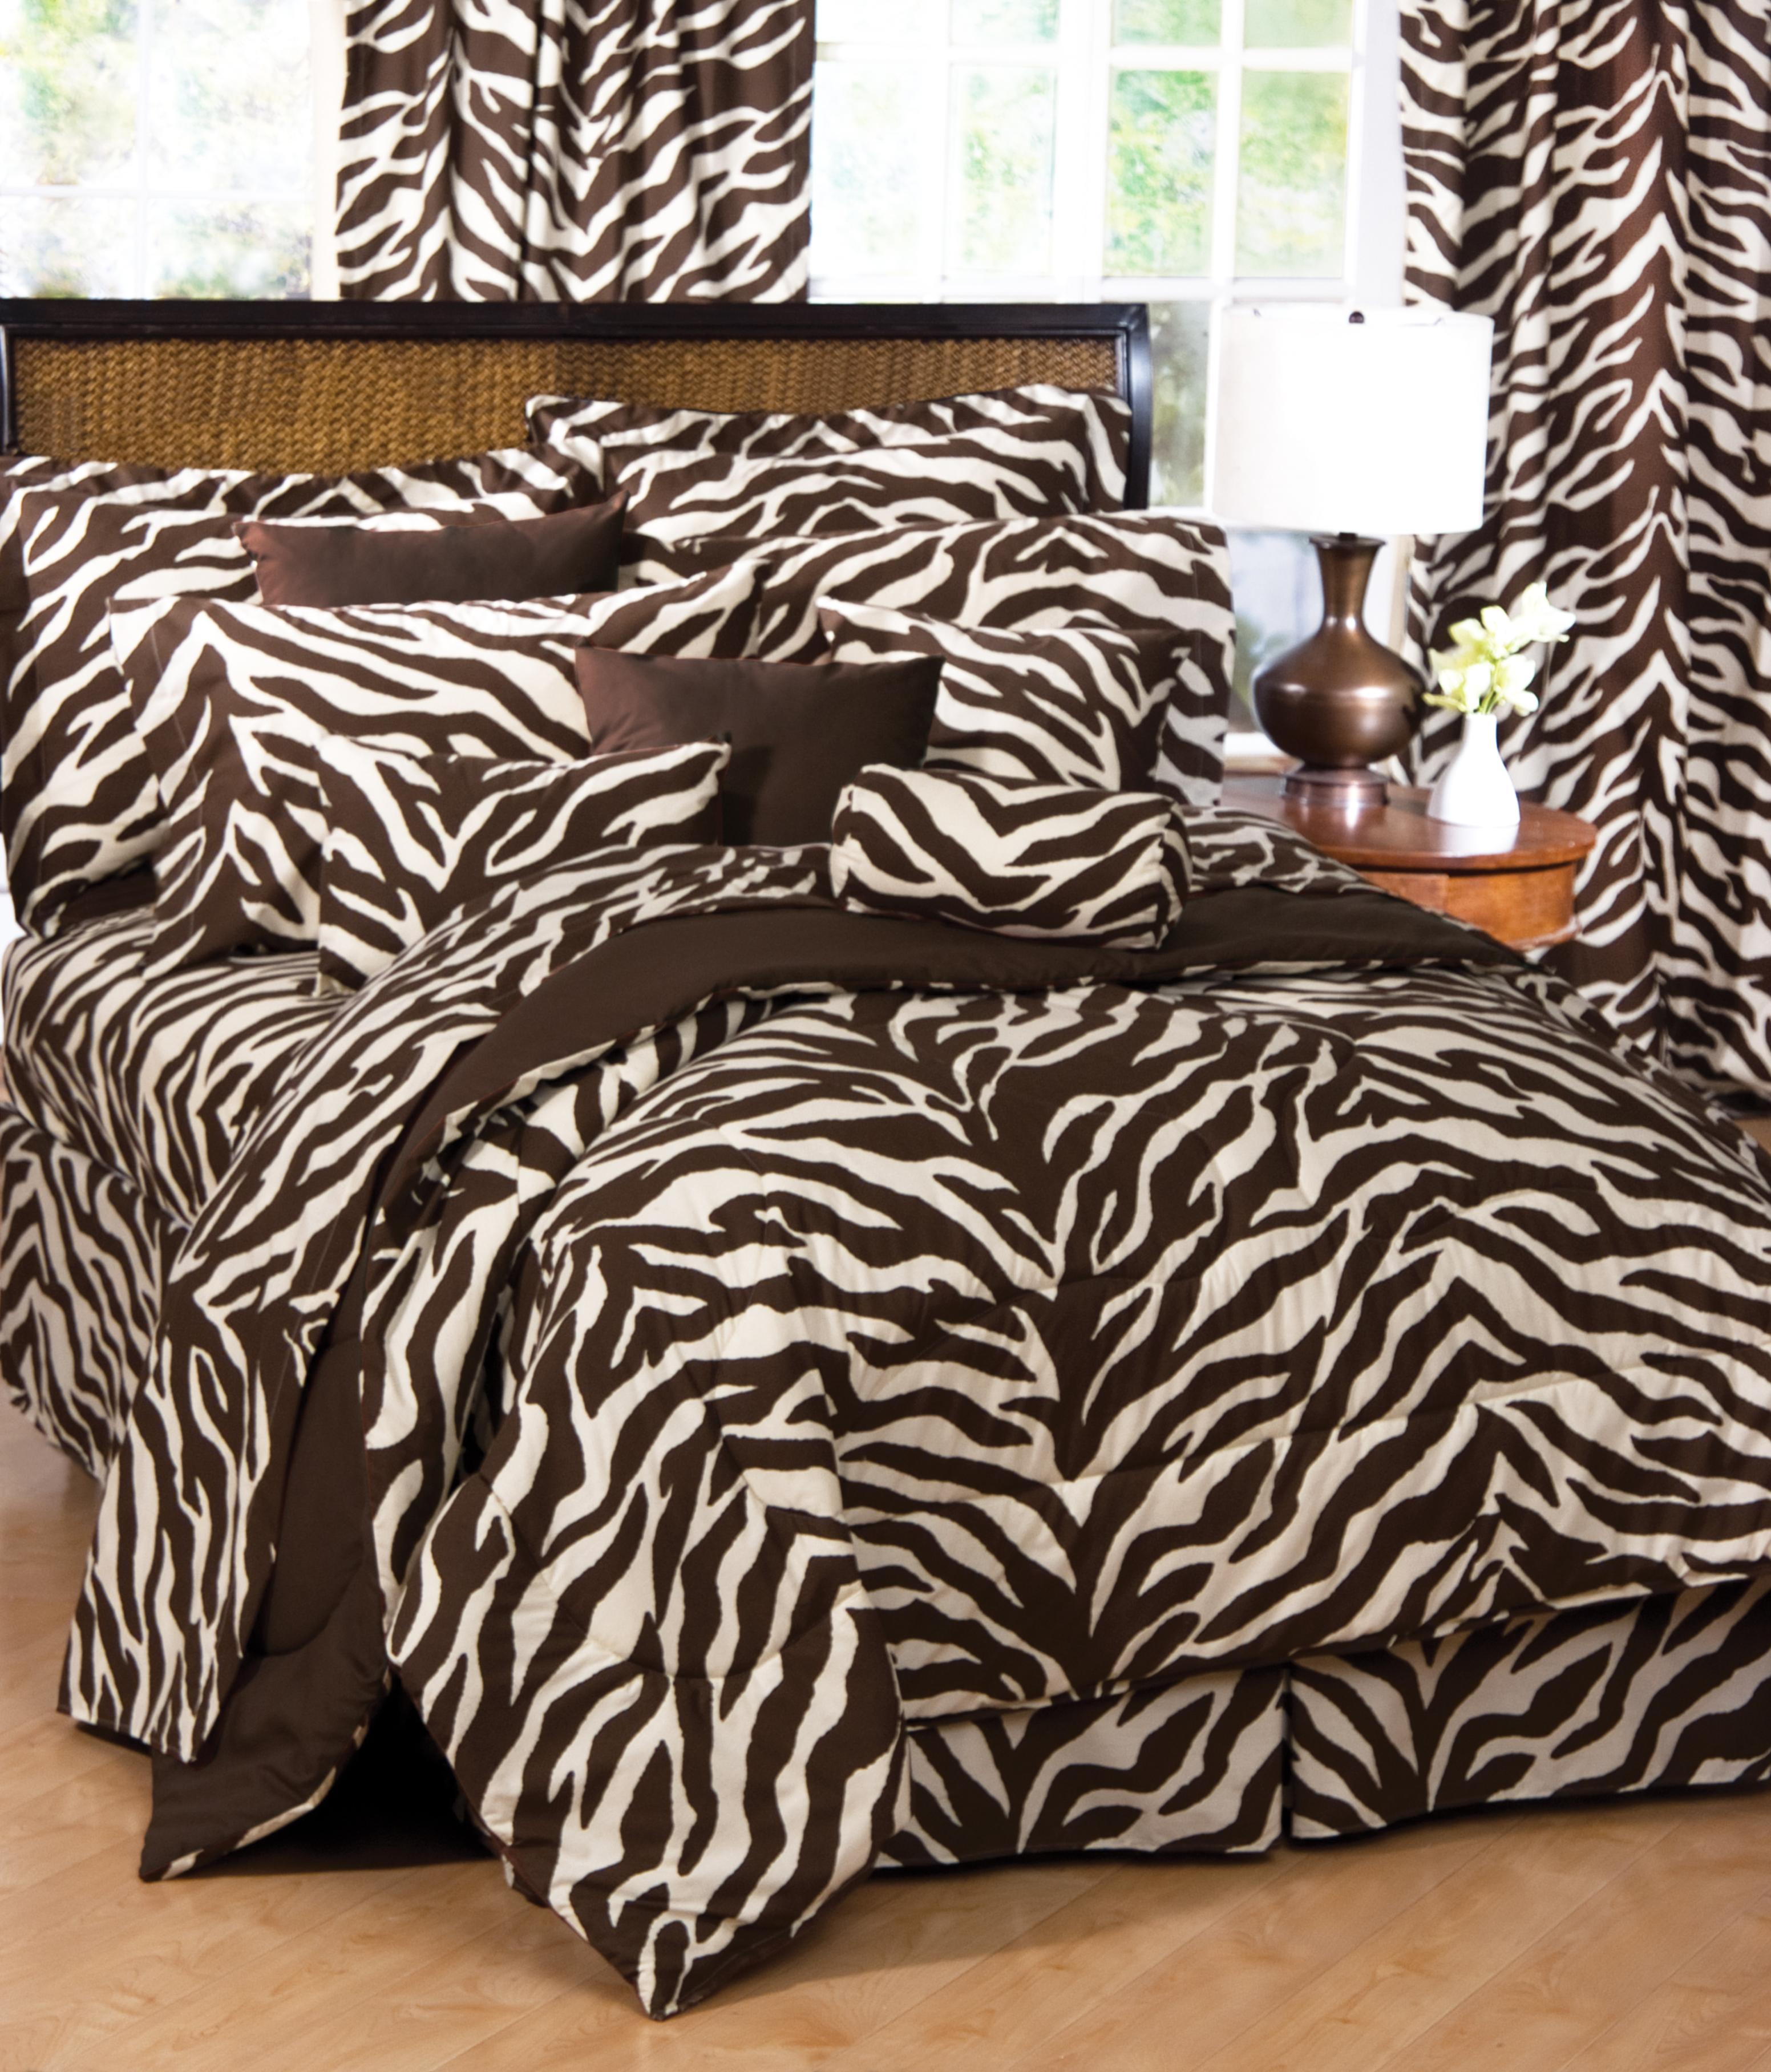 leopard bedroom accessories ~ accion